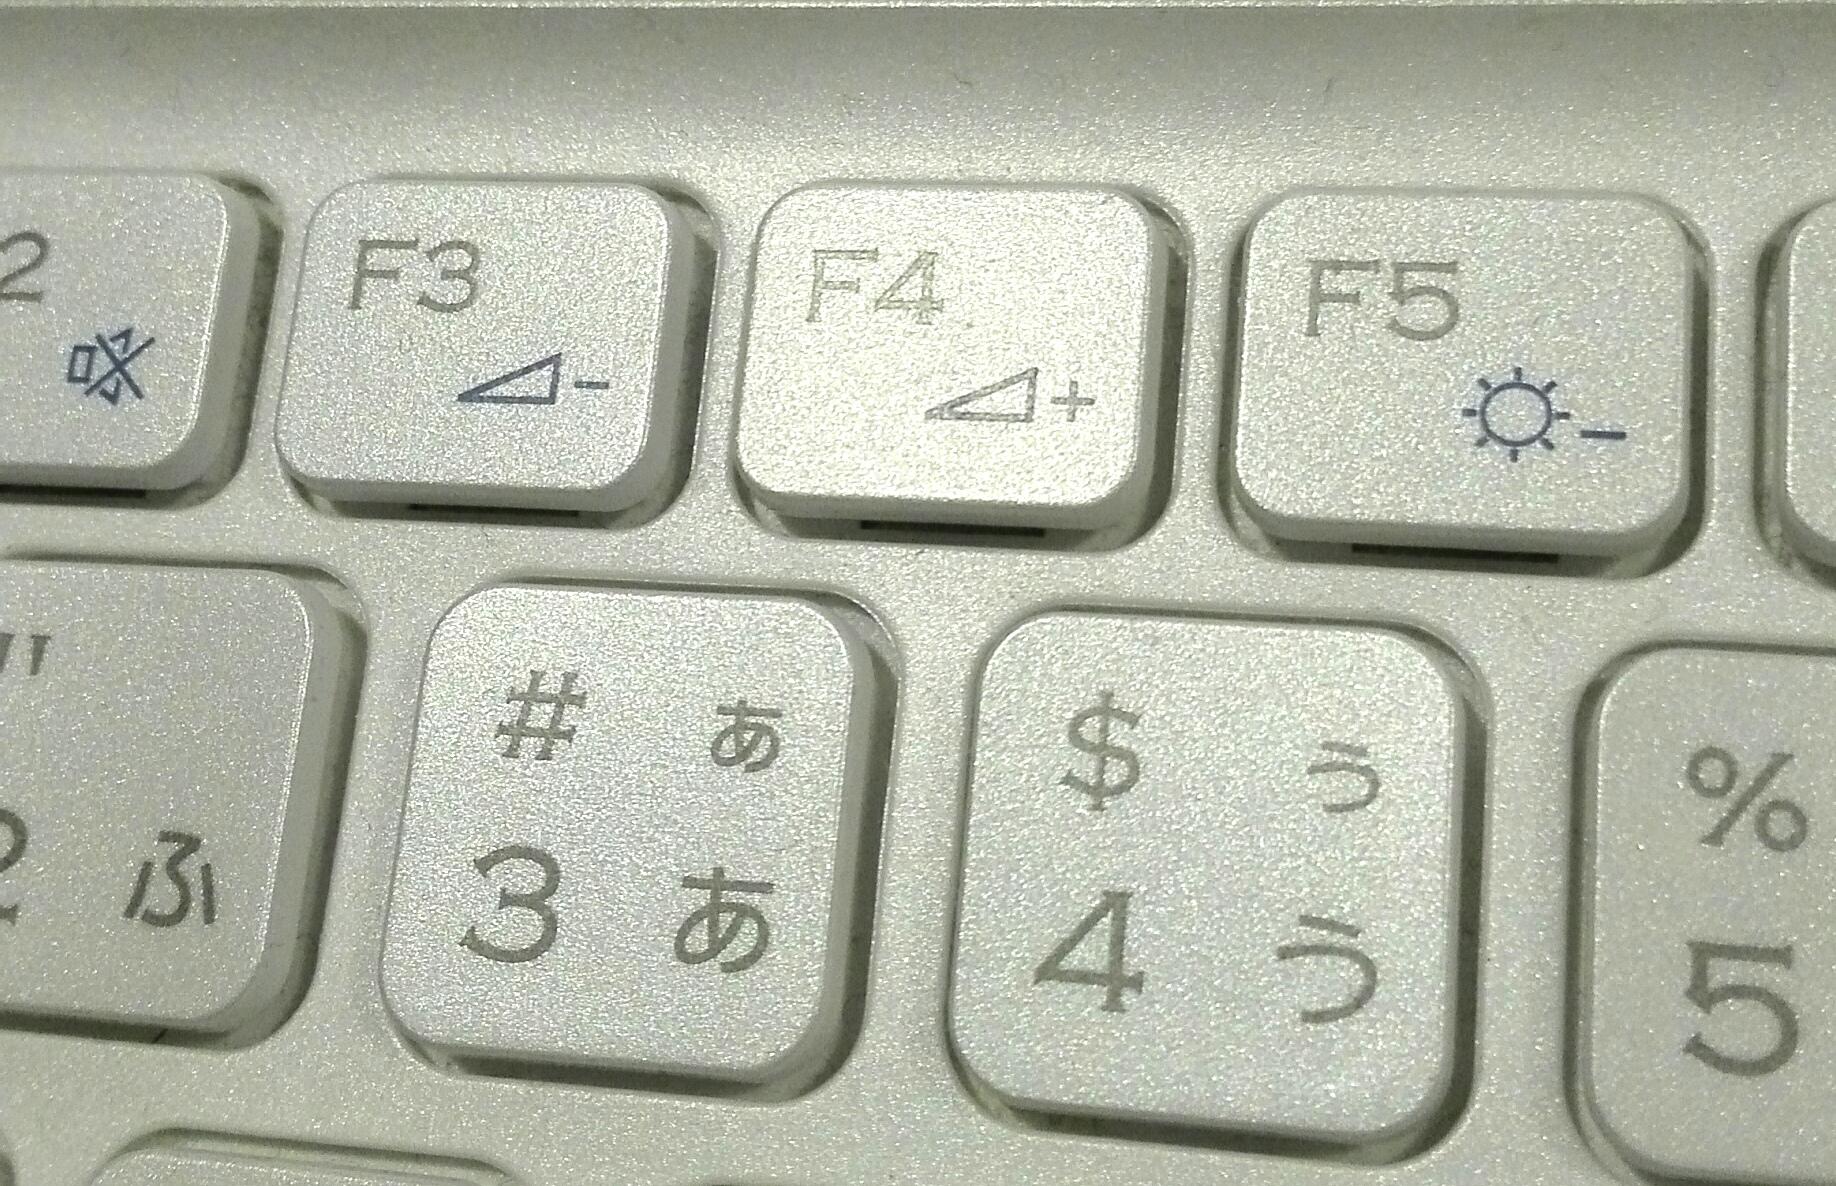 F4(繰り返し作業のショートカットキー)